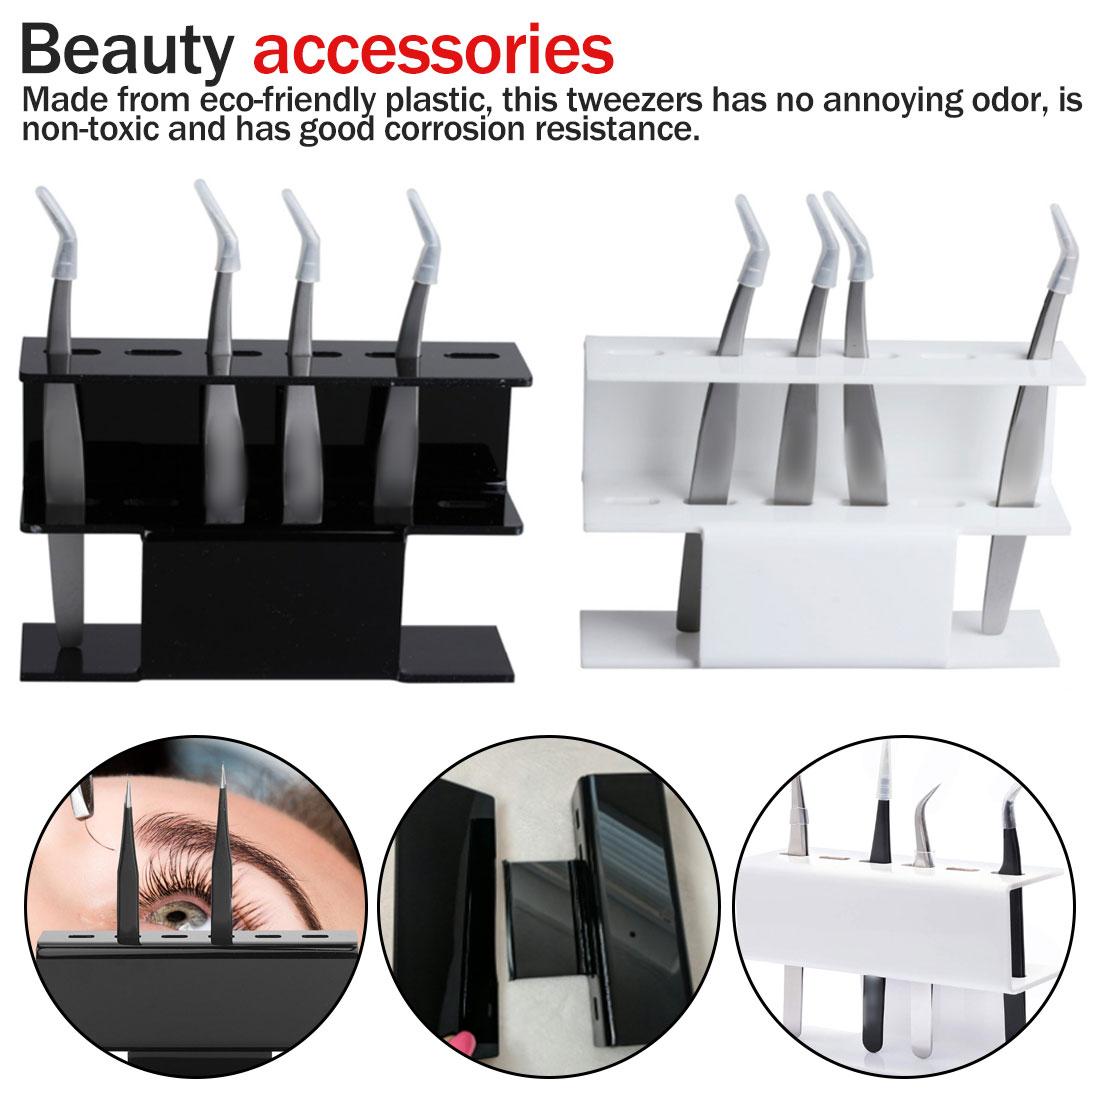 Eyelash Extension Plastic Tweezers Shelf Holder 6pcs Tweezer Stand Positions Eyelashes Beauty Make-Up Tools